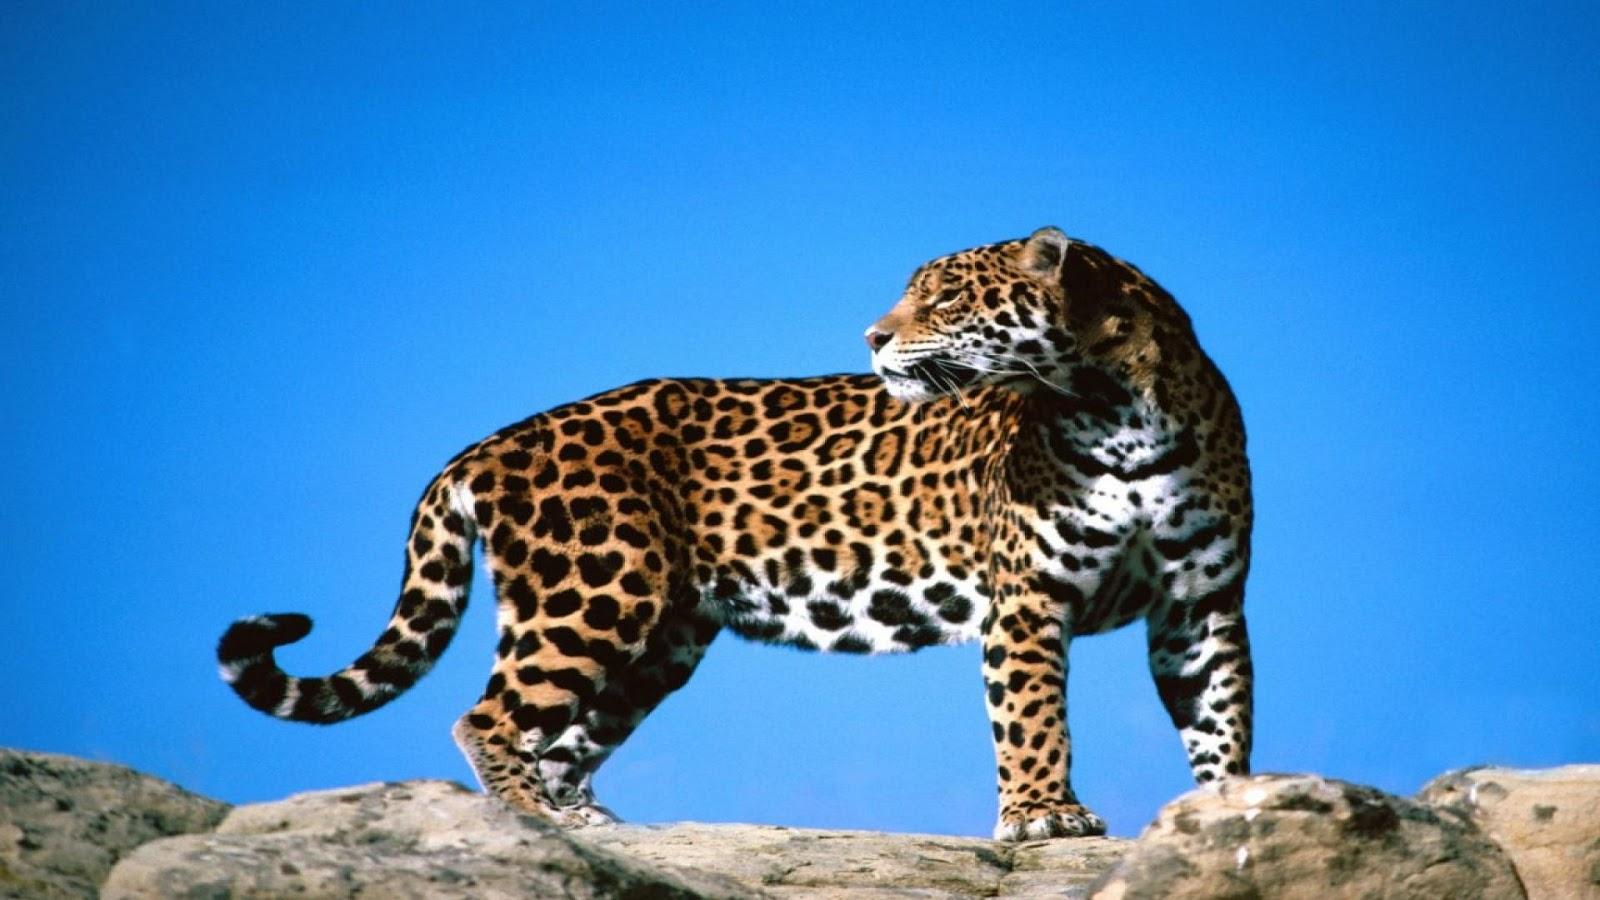 Download HD Wallpapers: Download Cheetah HD Wallpapers